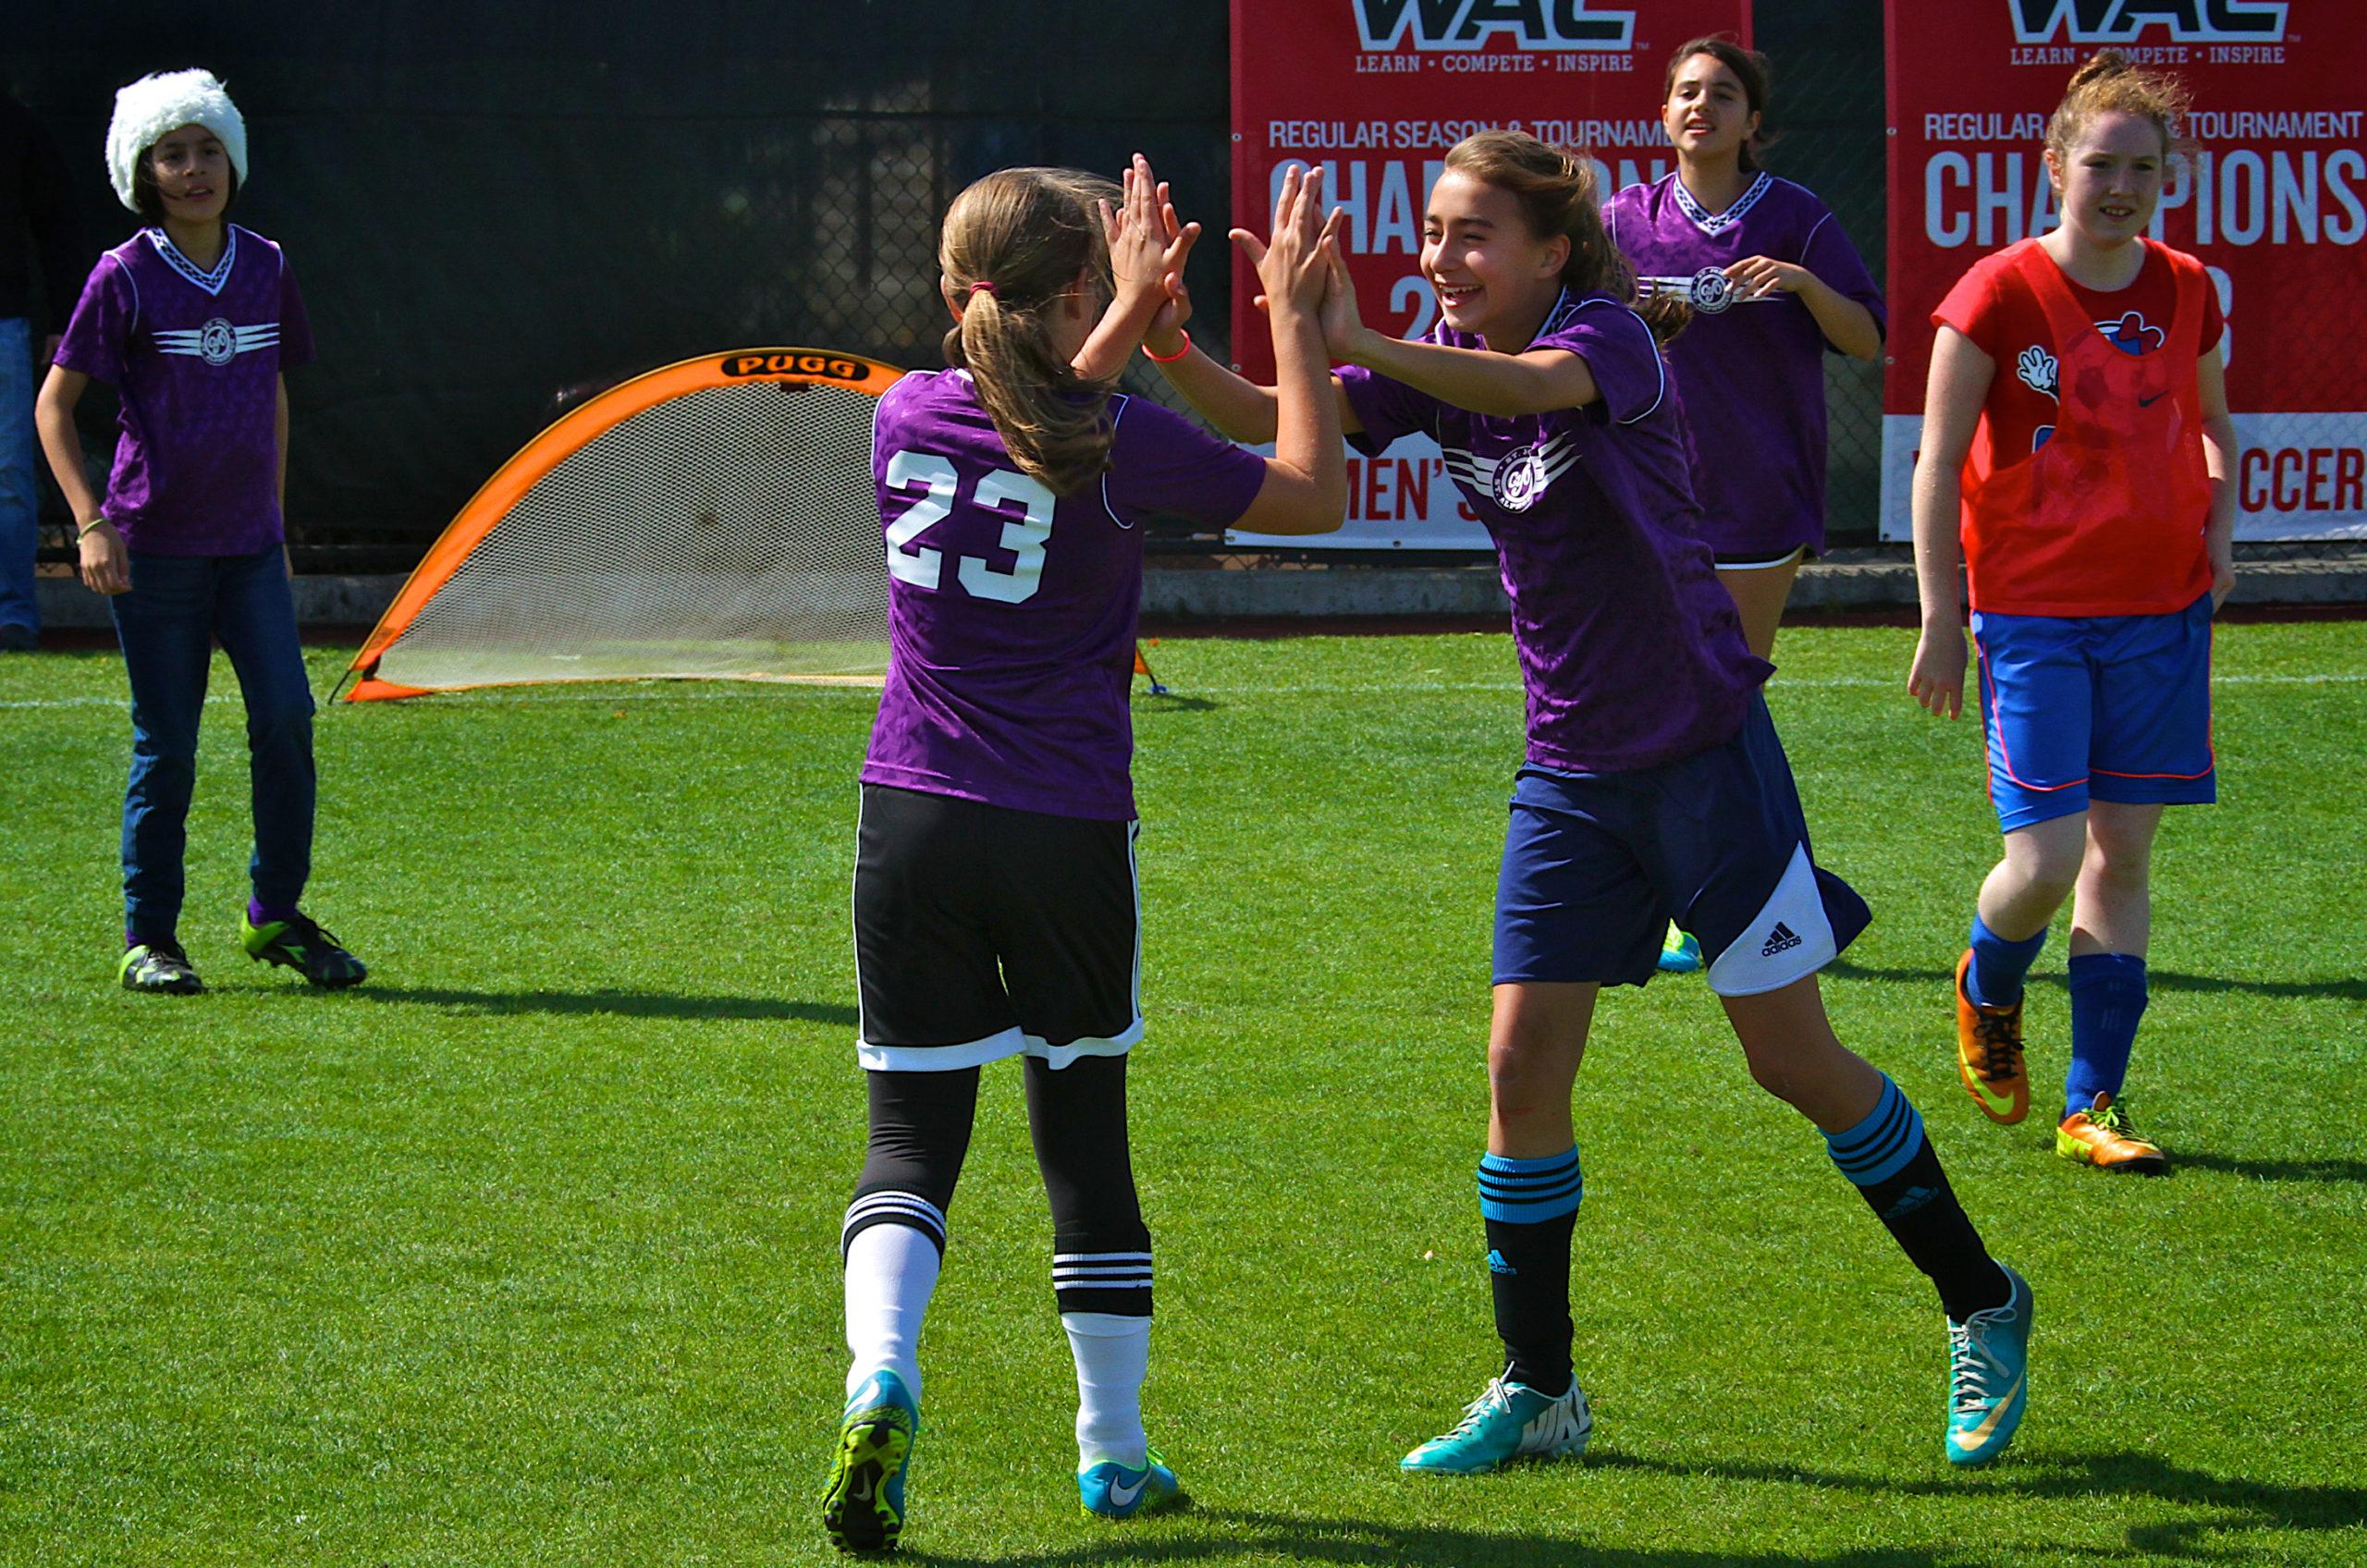 CYO Girls Soccer, Courtesy CYO Athletics, purple, celebration, youth, happy, goal, soccer, August 29, 2015, team Sts Joseph/ Alphonsus.